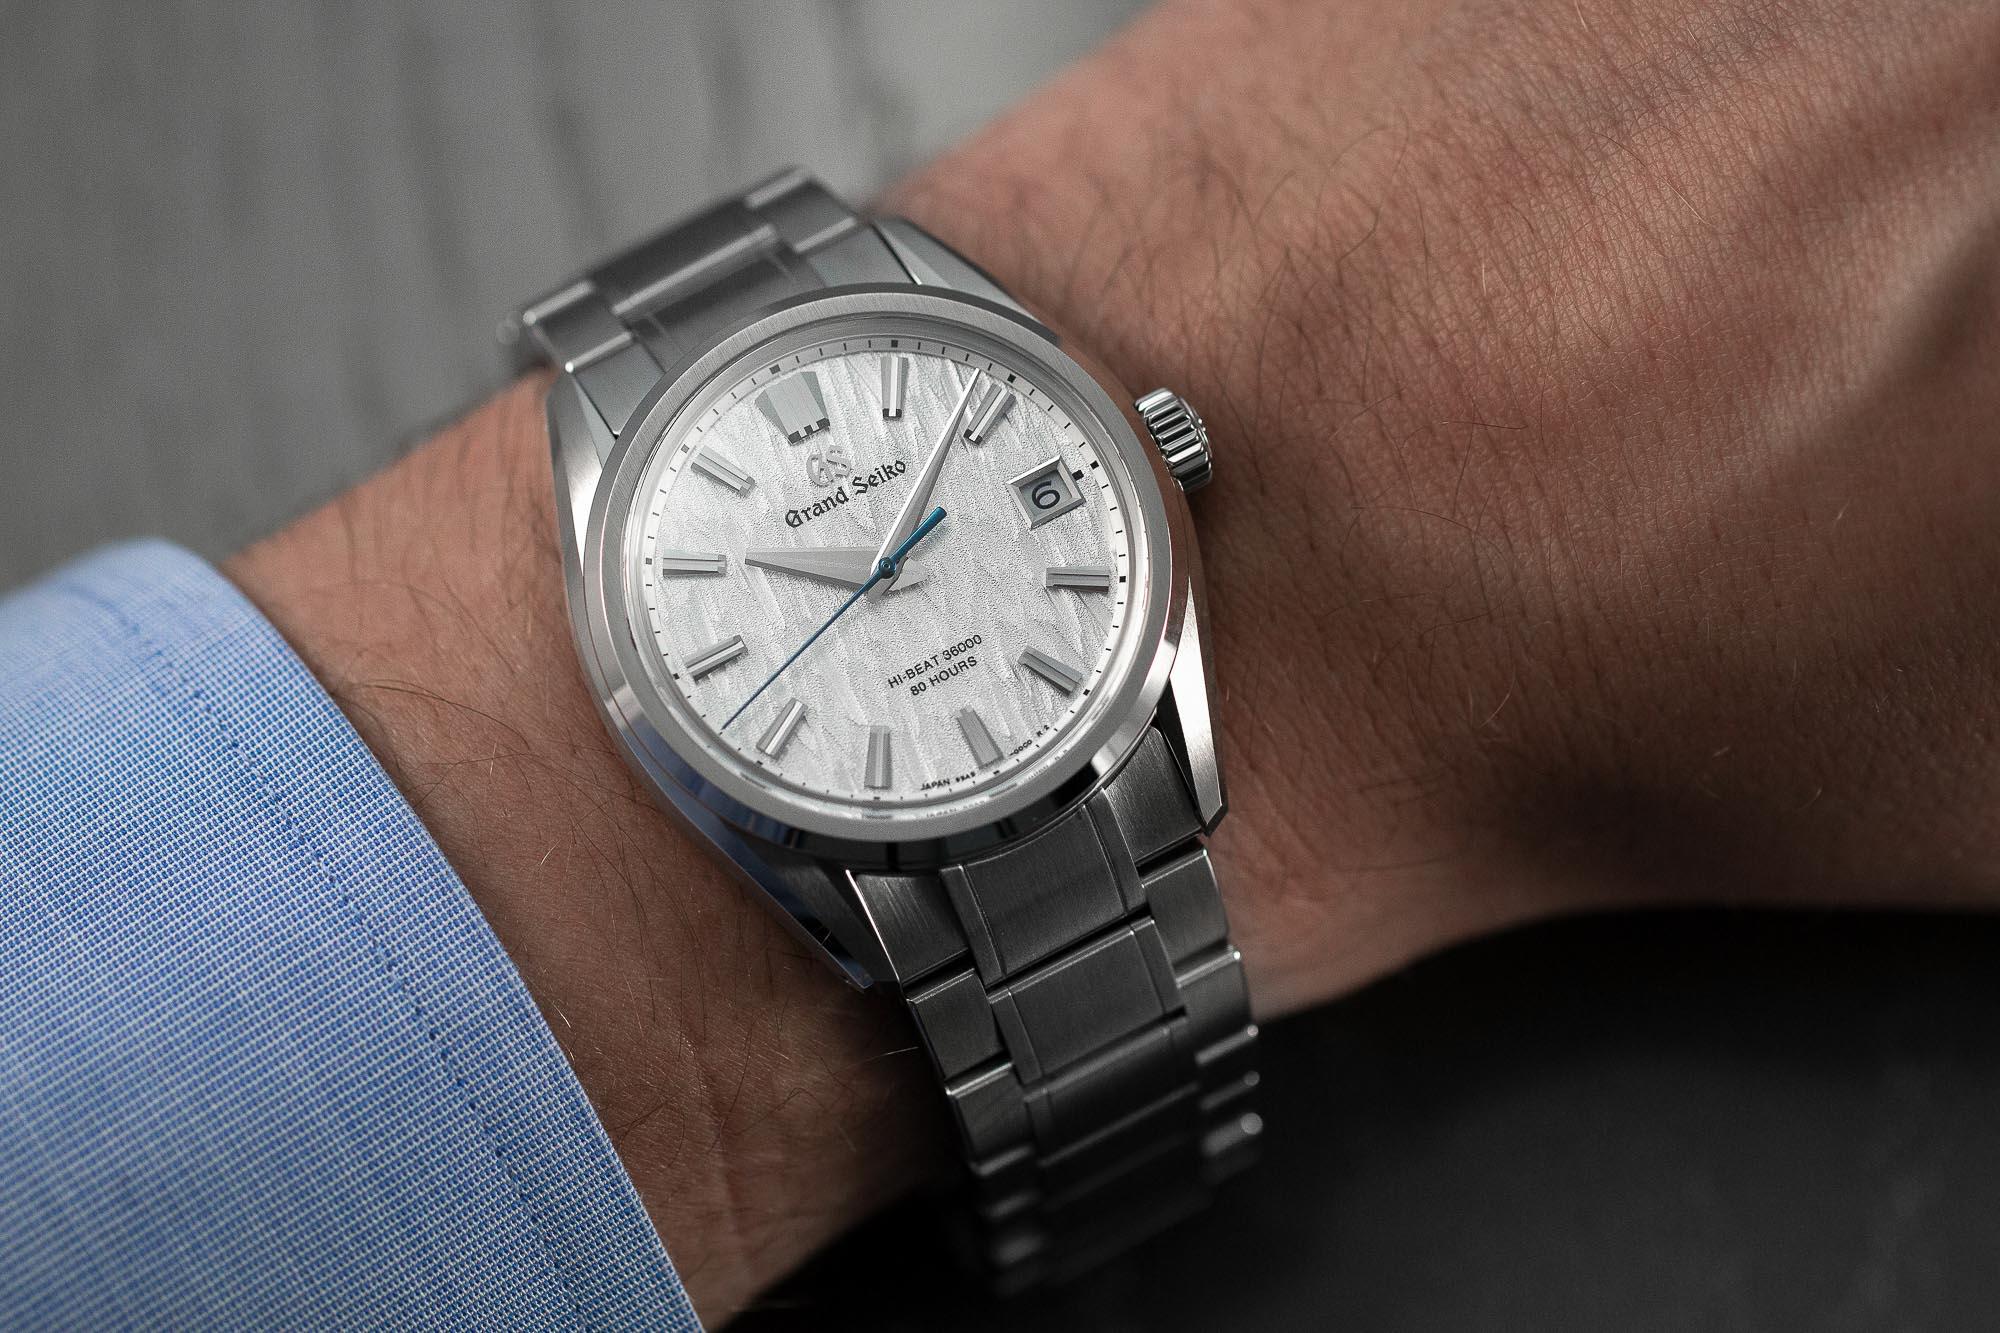 Grand Seiko SLGH005 stainless steel wristwatch worn on the wrist.